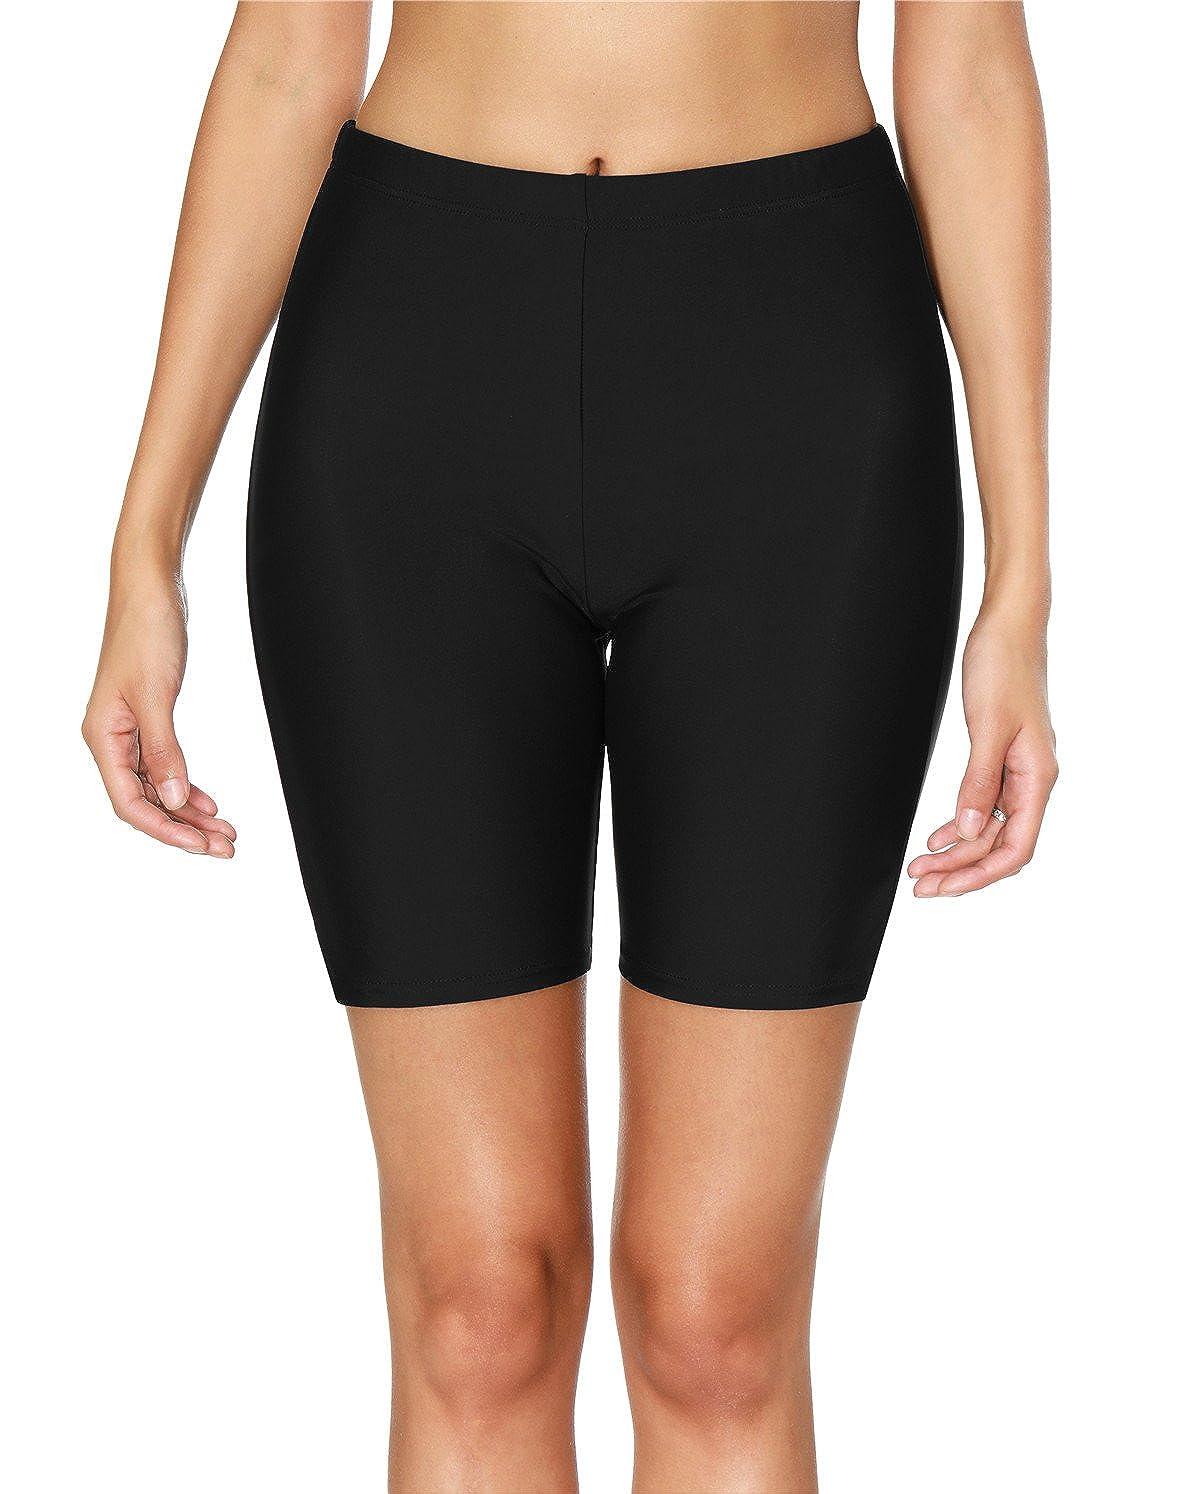 ATTRACO Women Swim Shorts Board Shorts Swimming Bottoms Long Boardshorts Black